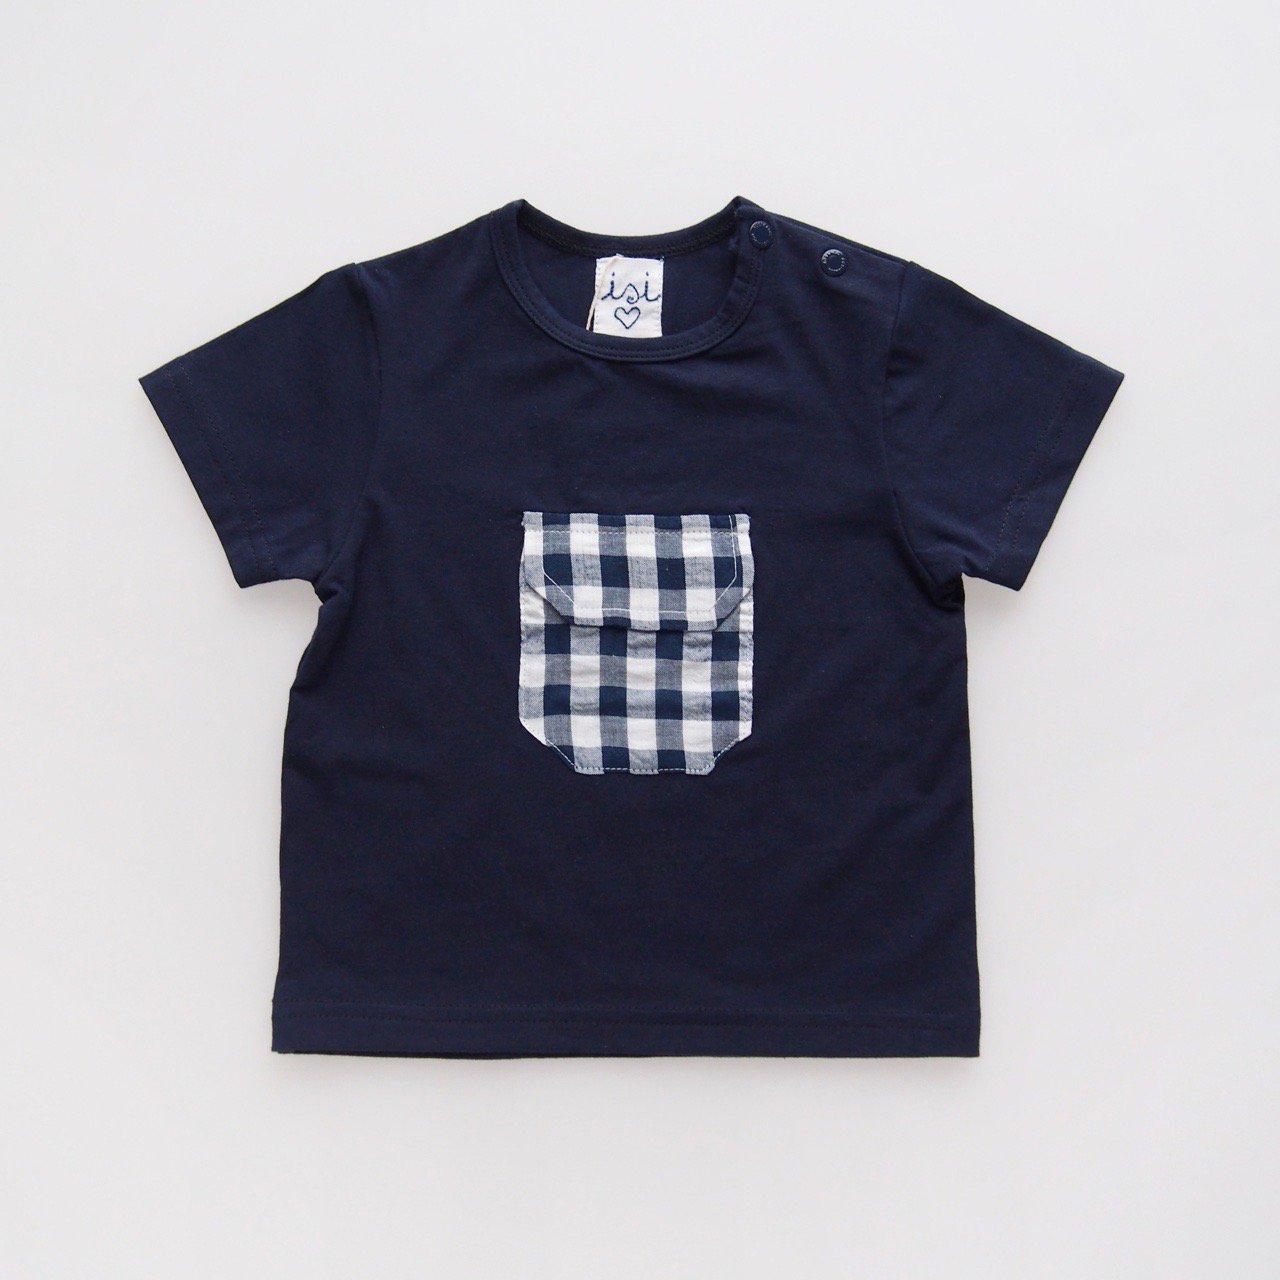 <img class='new_mark_img1' src='https://img.shop-pro.jp/img/new/icons14.gif' style='border:none;display:inline;margin:0px;padding:0px;width:auto;' />Malvi&Co. - Gingham pocket T-shirt (Green/ Navy)